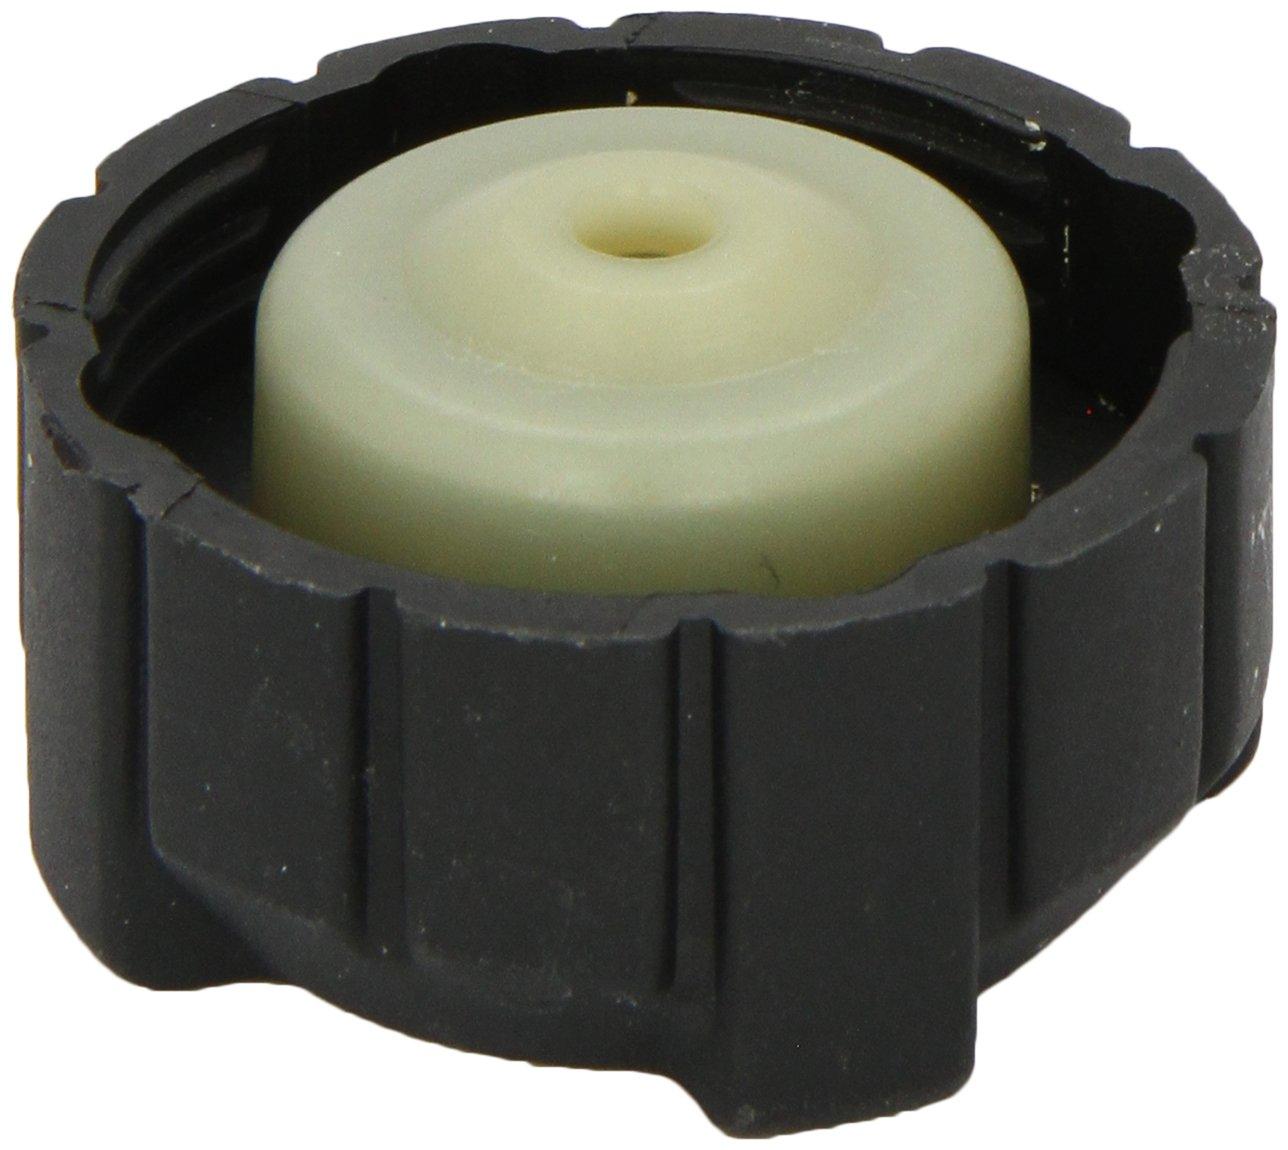 VAICO V24-0219 Bouchon, ré servoir de liquide de refroidissement réservoir de liquide de refroidissement VIEROL AG